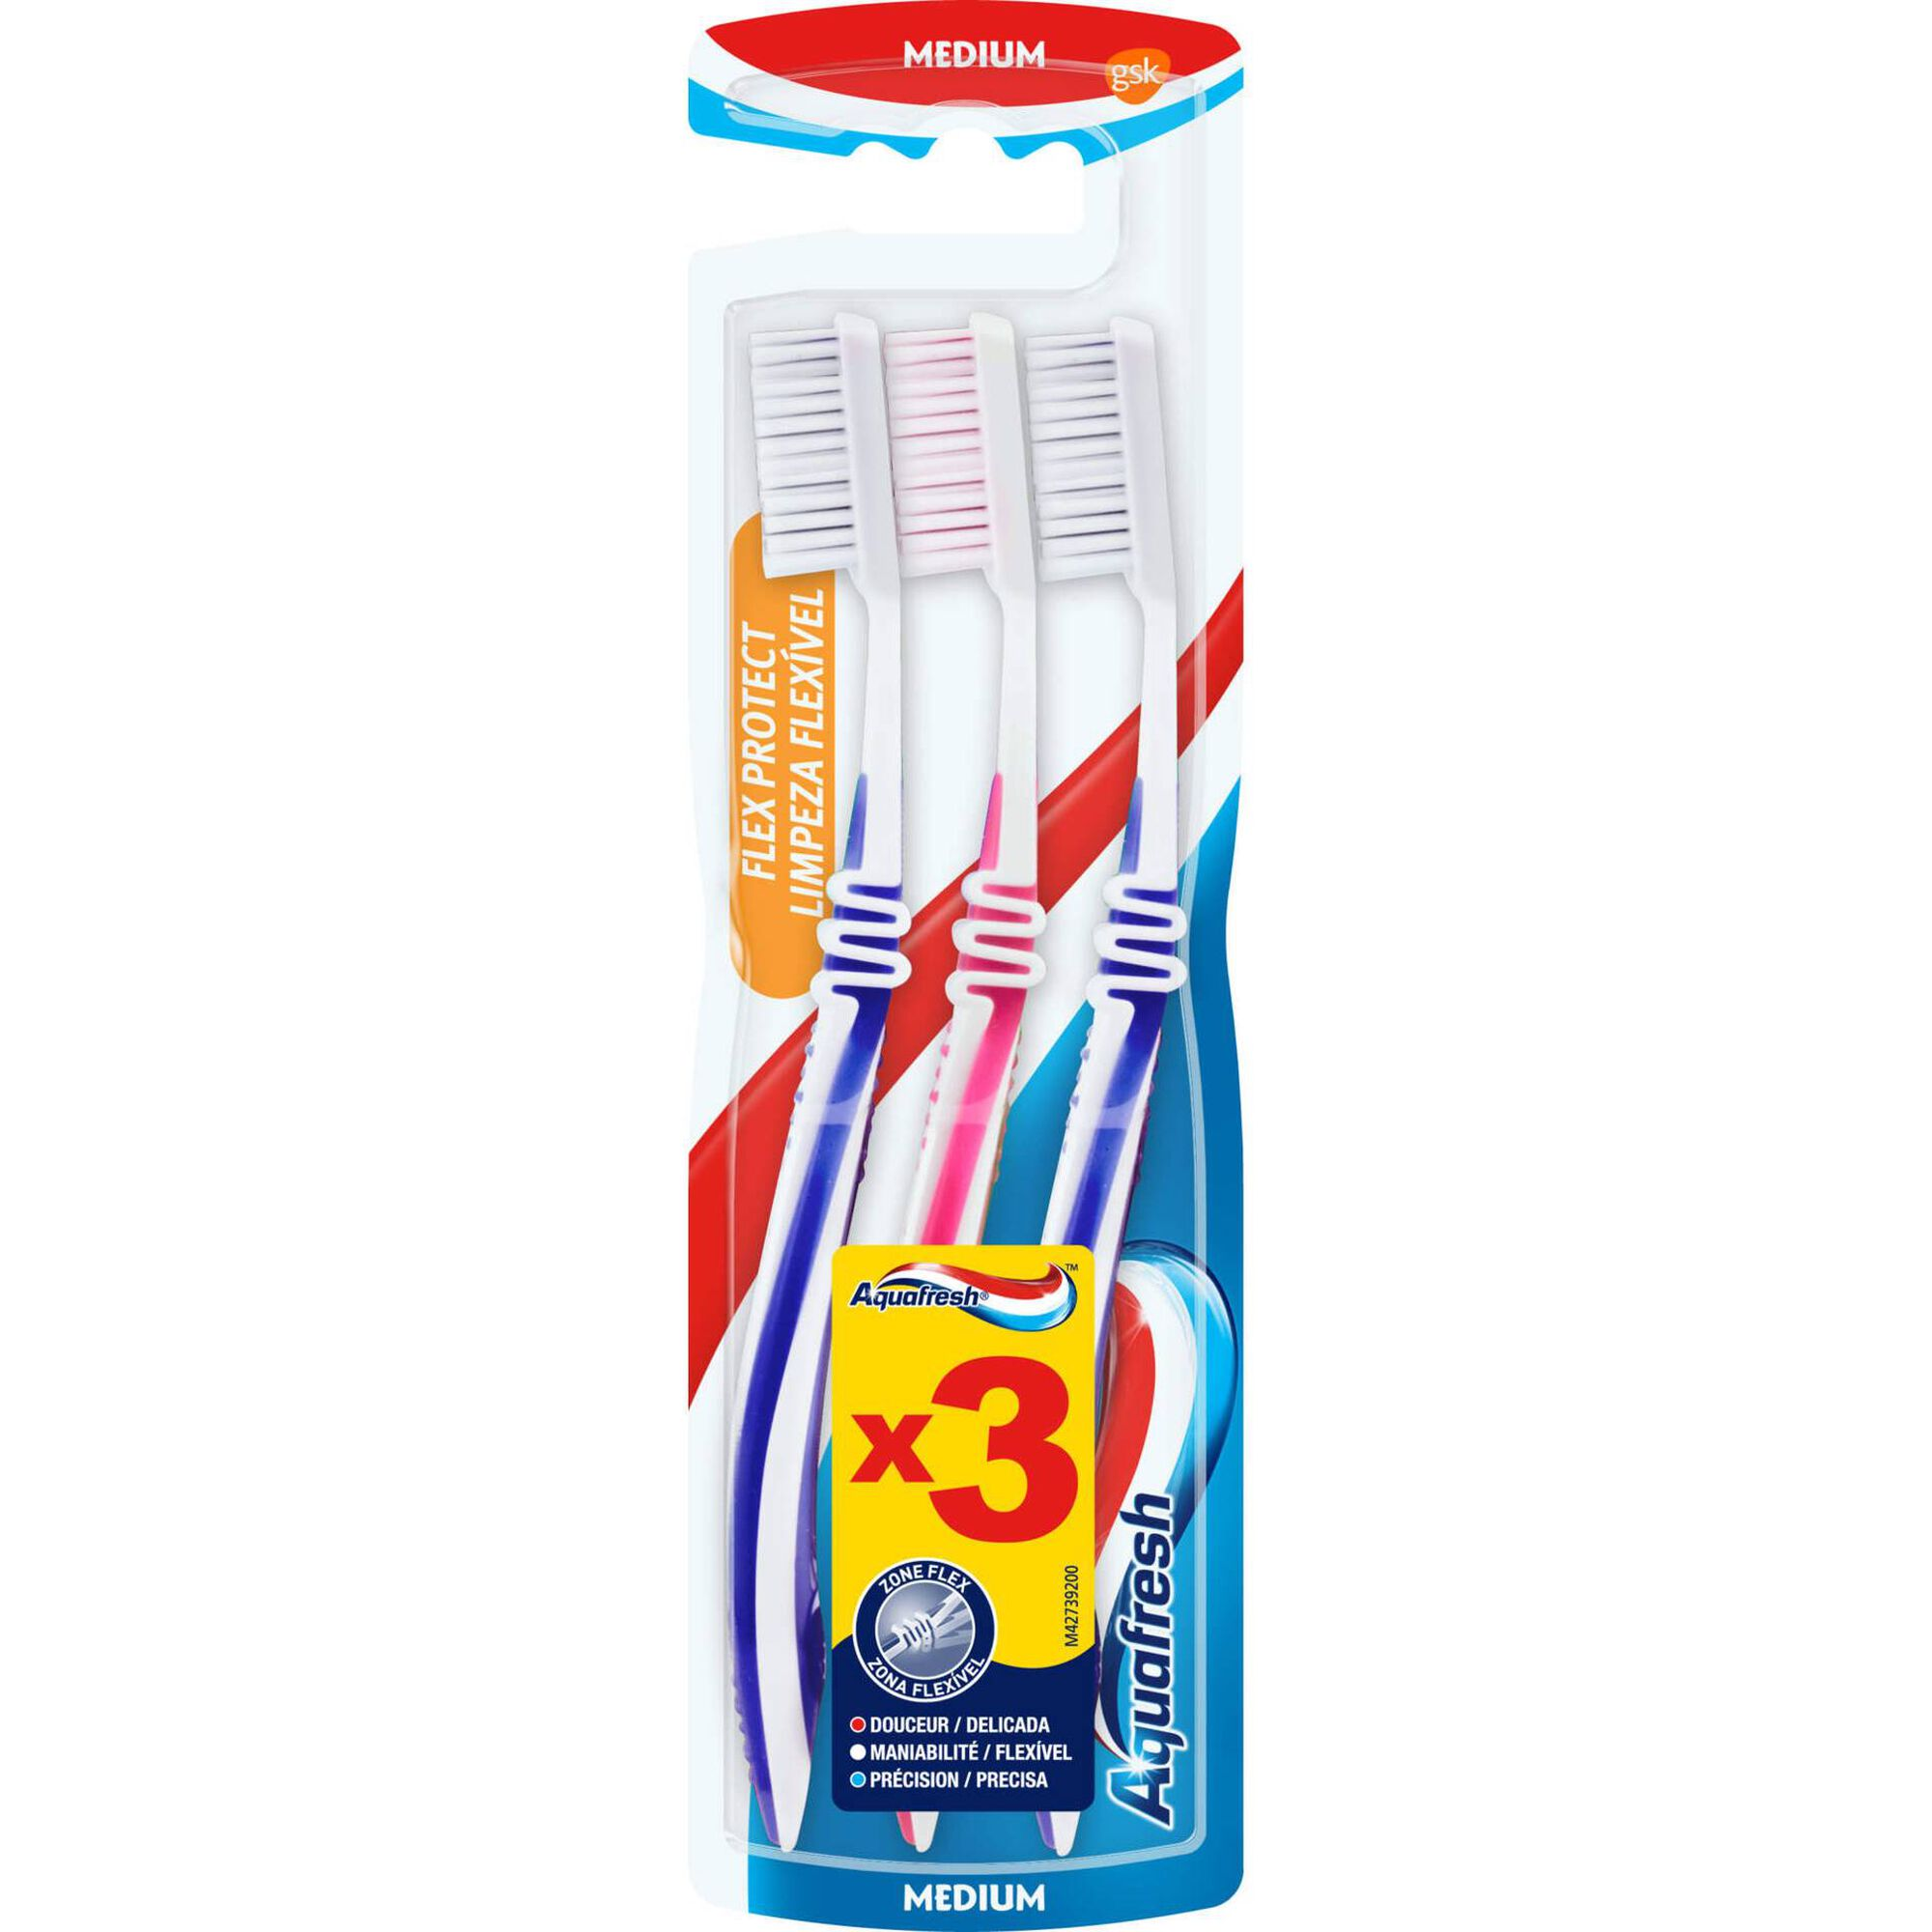 Escova de Dentes Limpeza Flexível